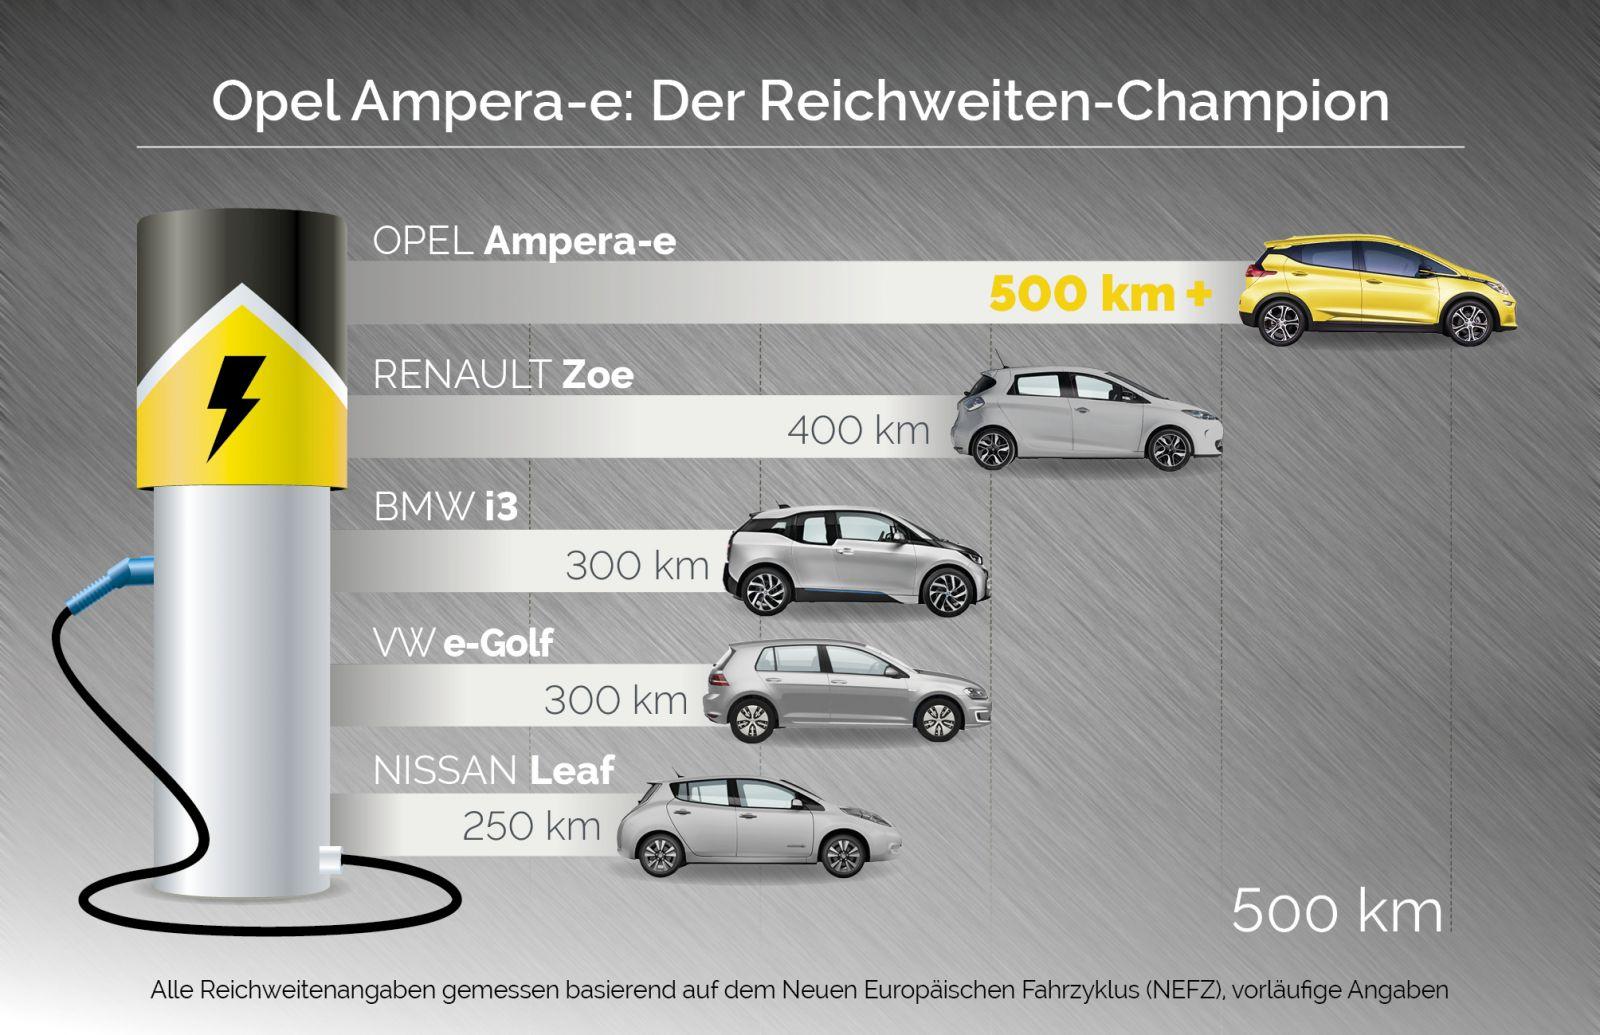 opel-ampera-e-range-500-km-nedc-update